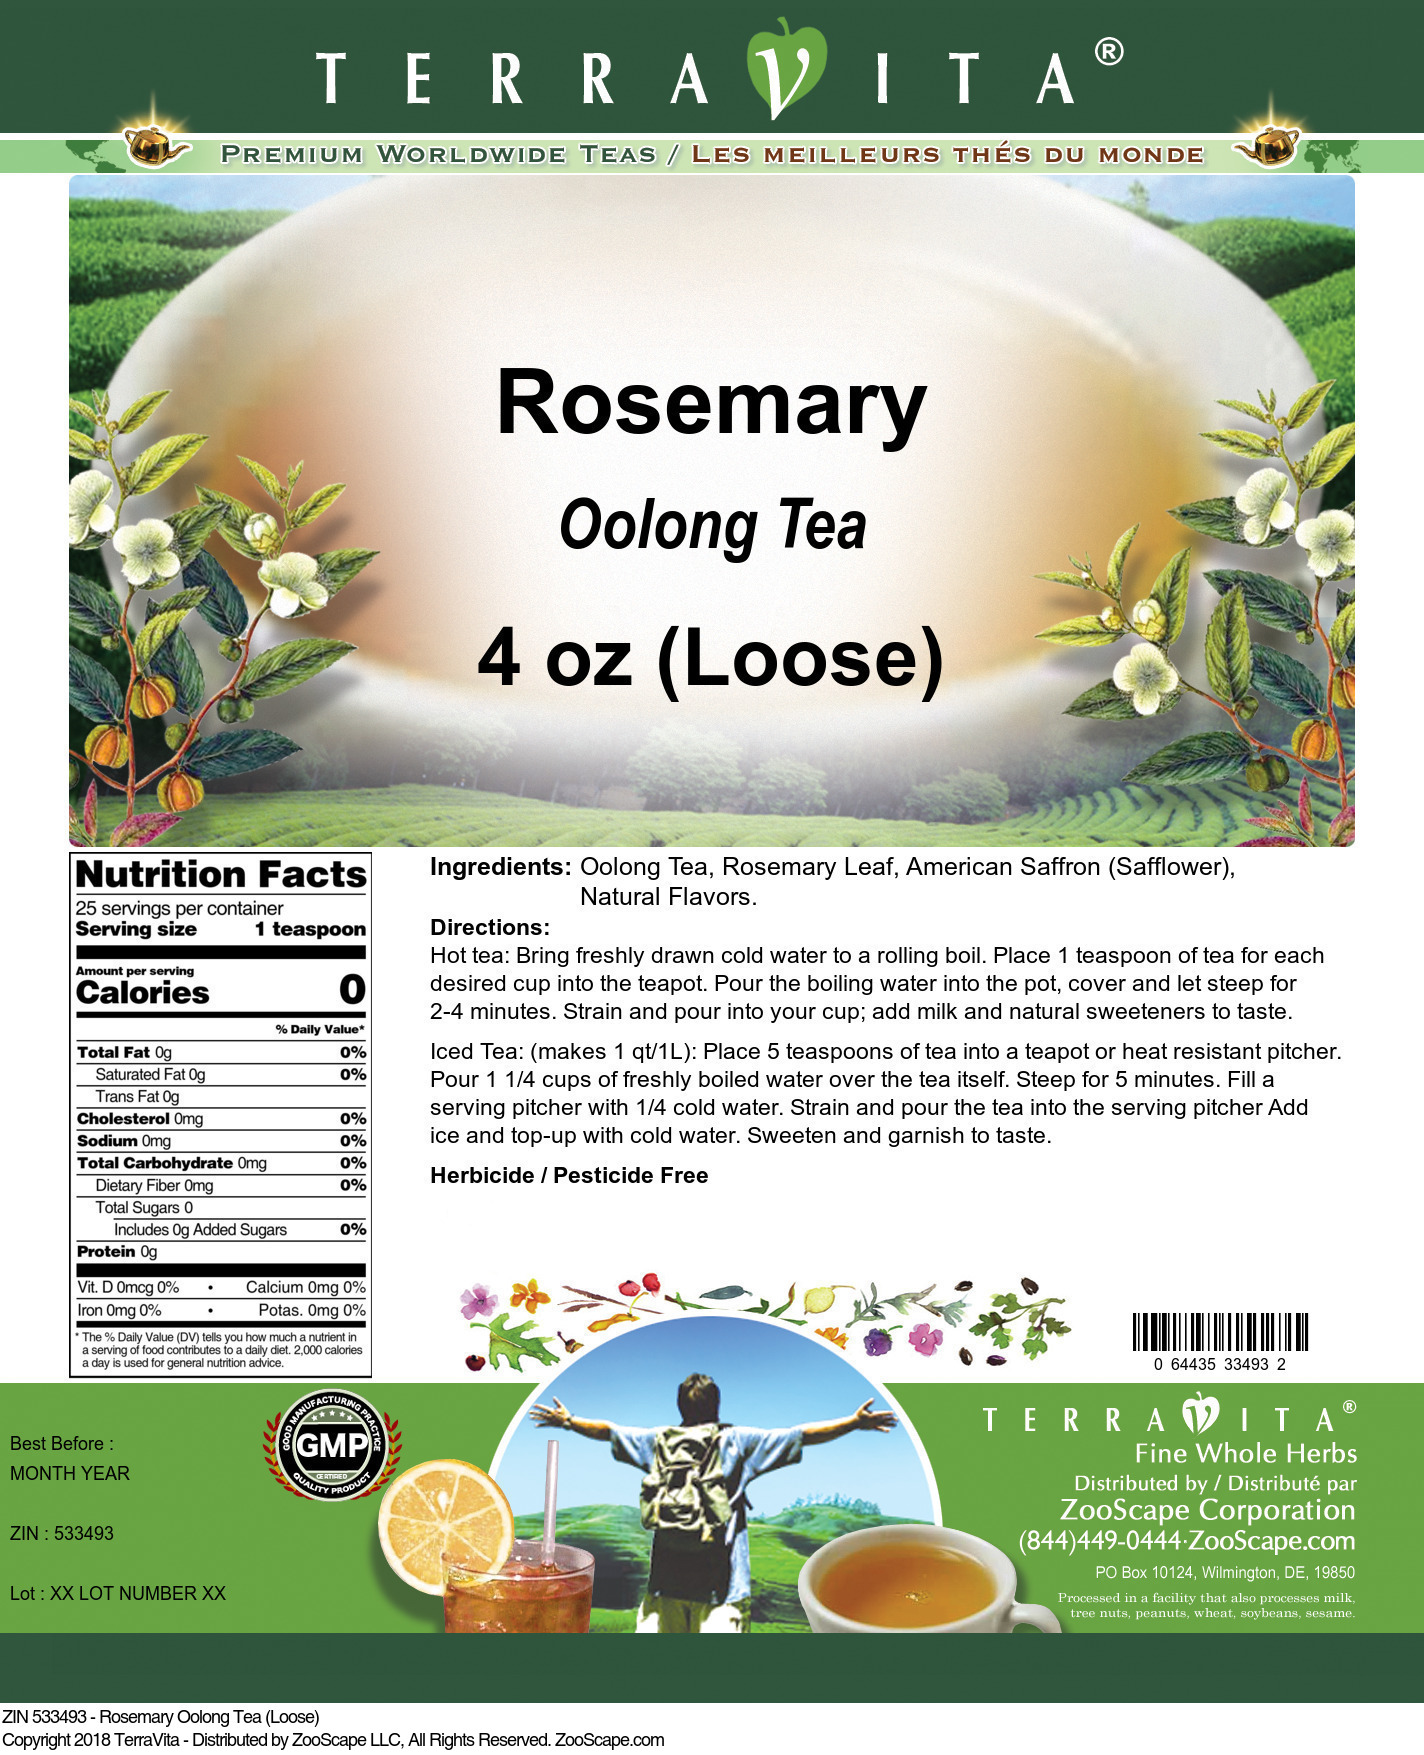 Rosemary Oolong Tea